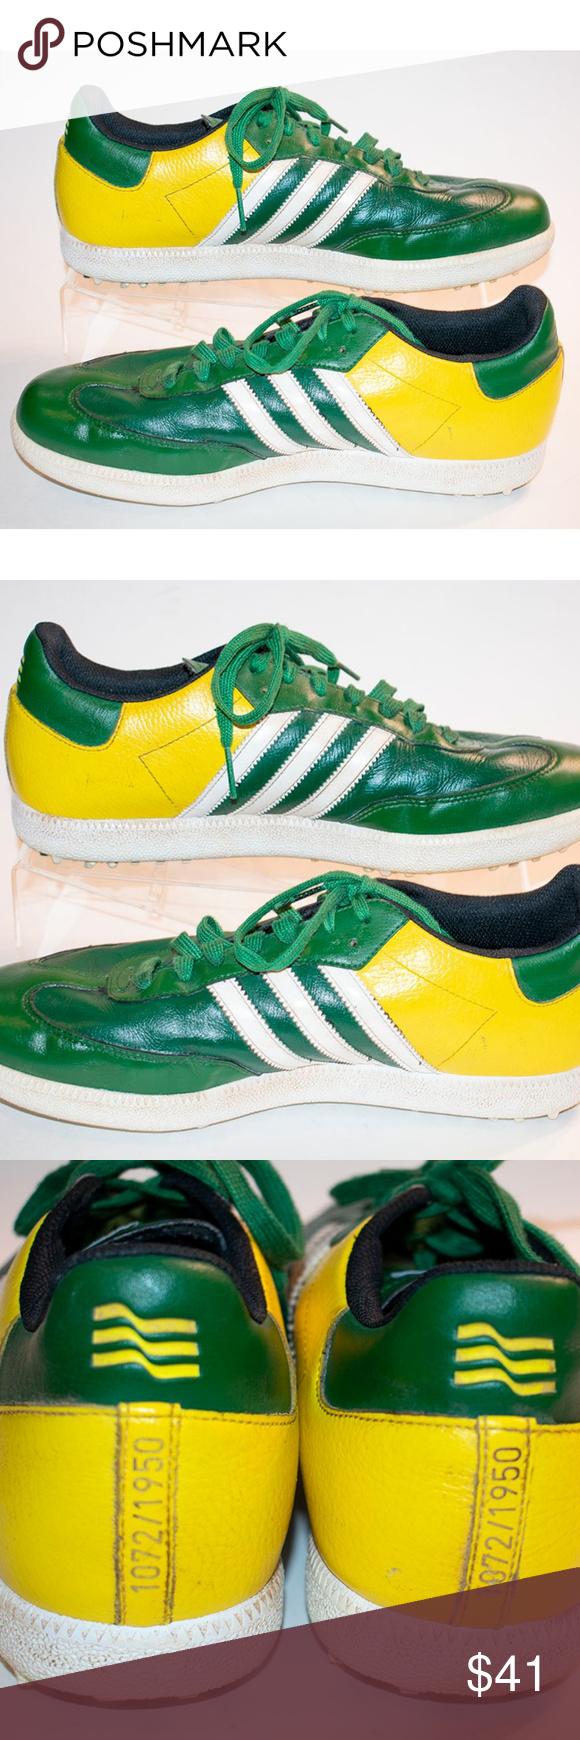 adidas samba 2012